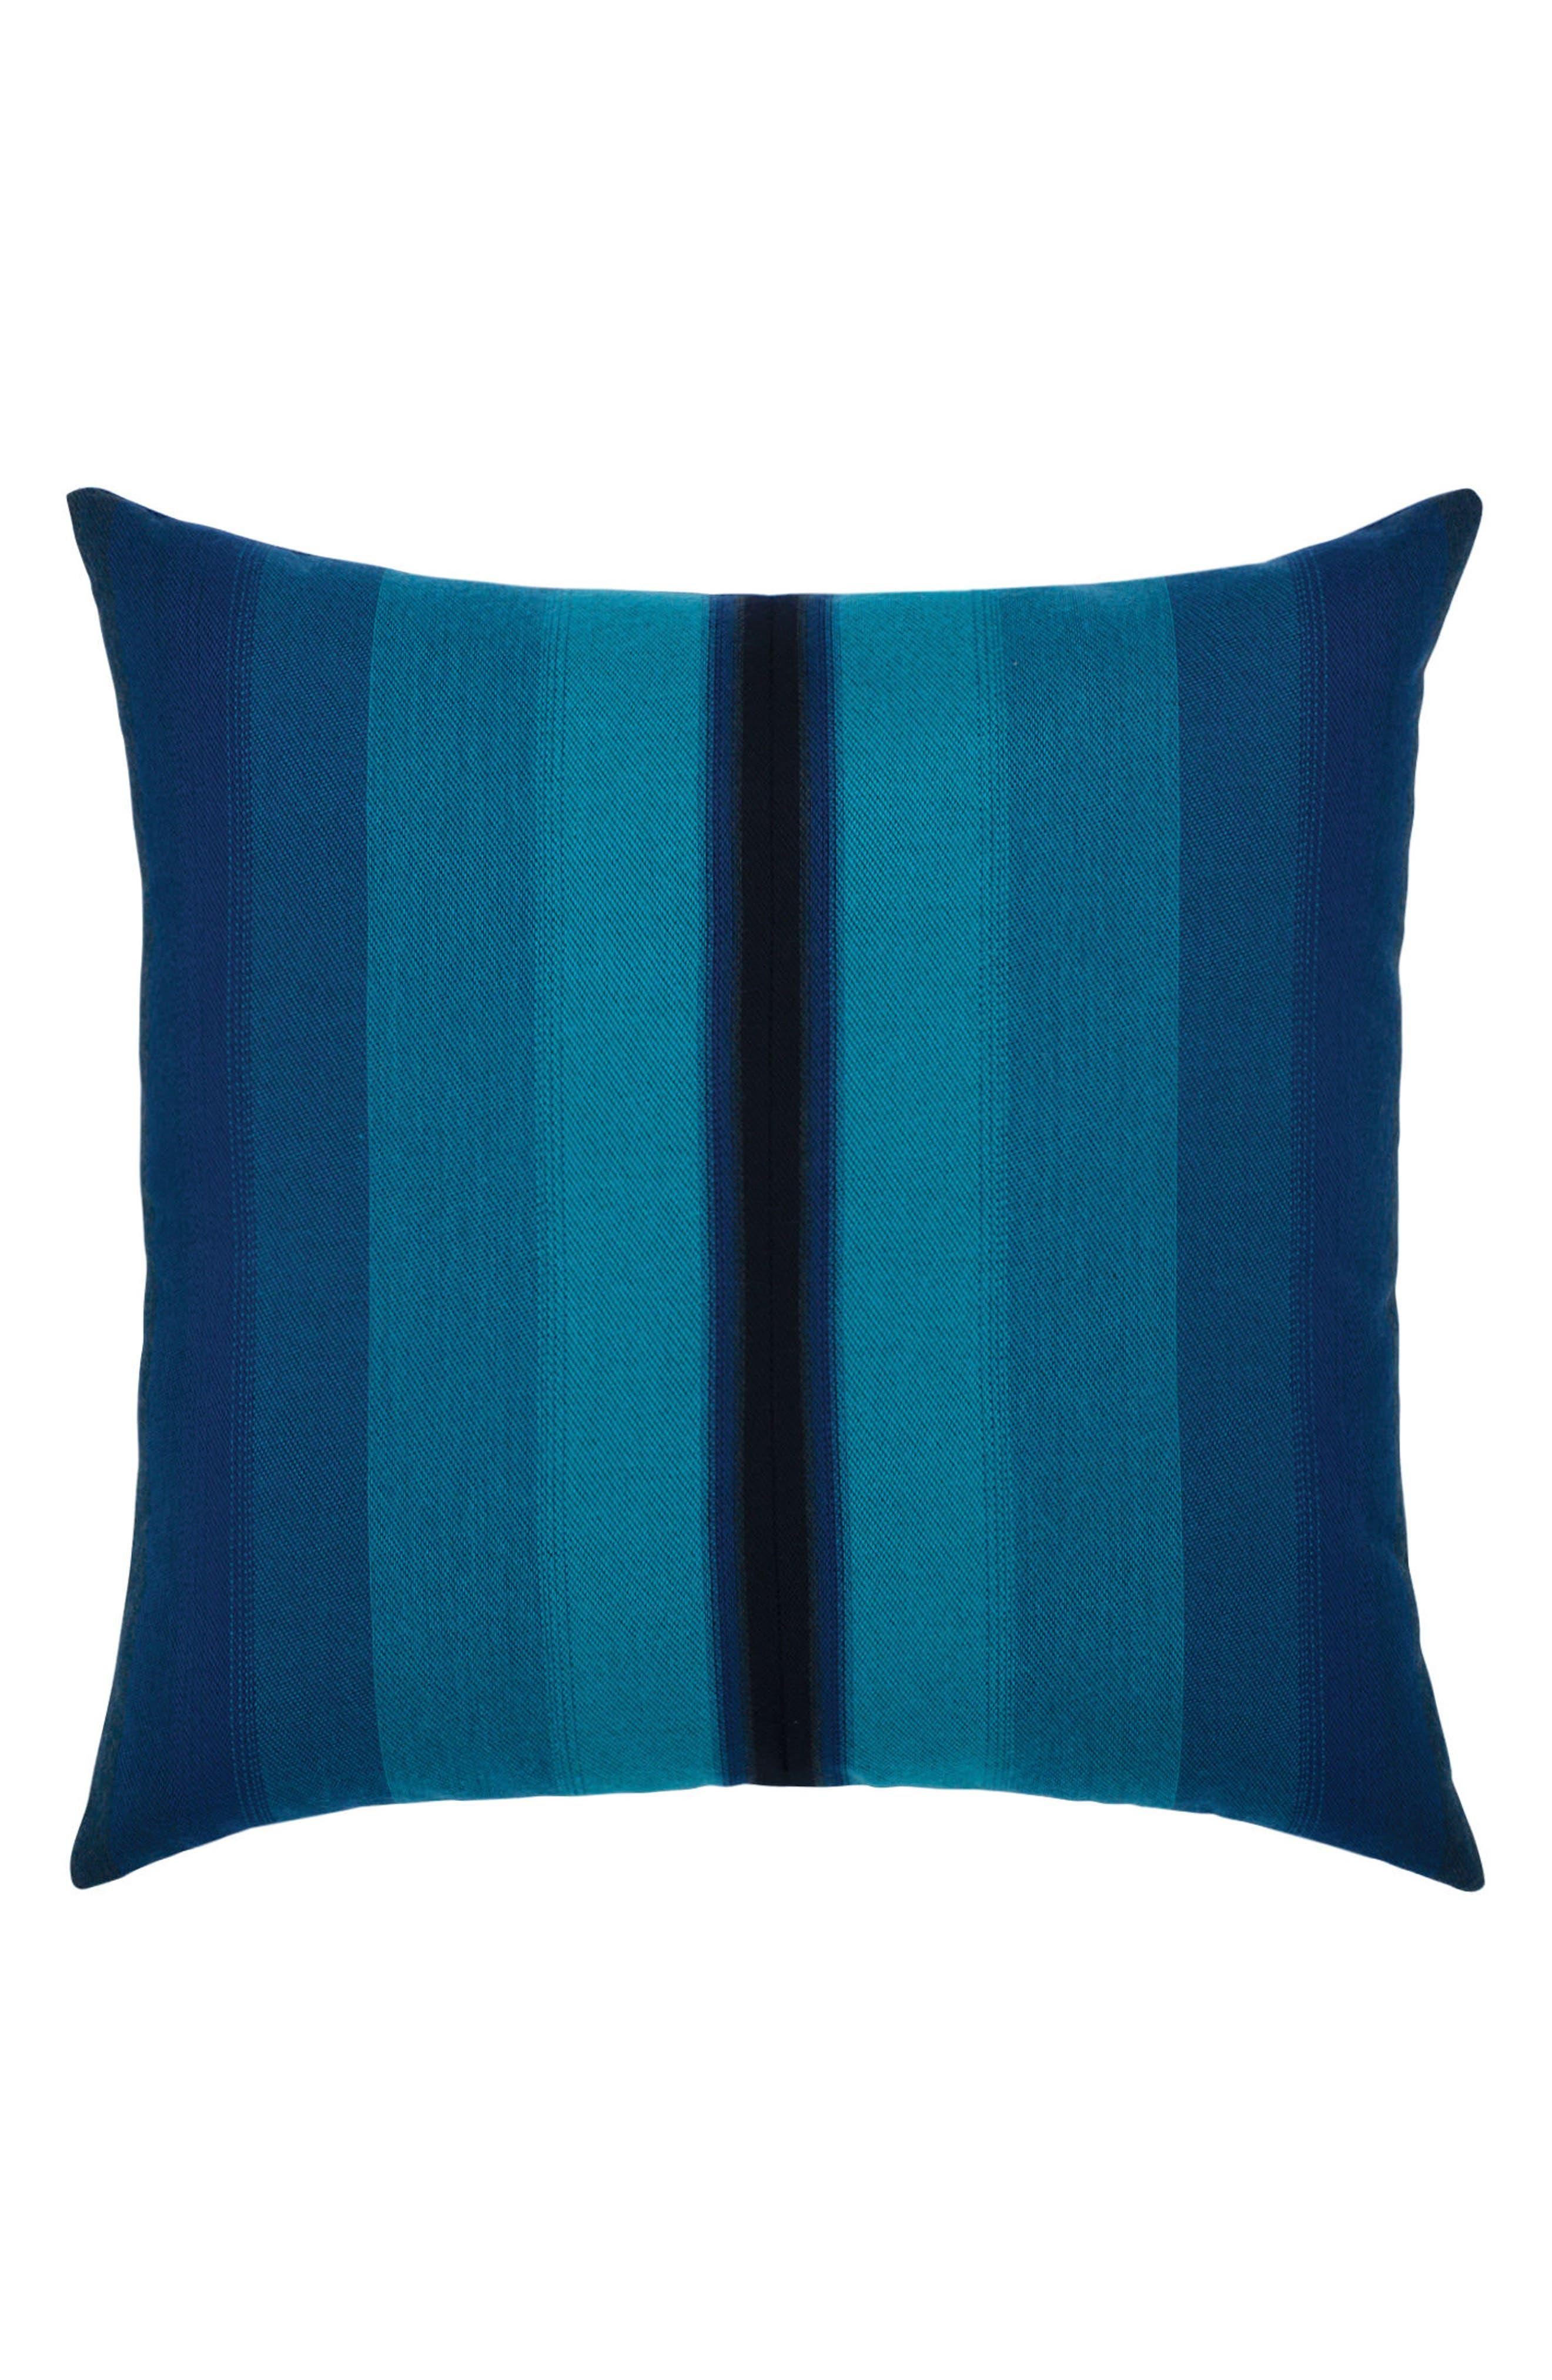 Ombré Azure Indoor/Outdoor Accent Pillow,                             Main thumbnail 1, color,                             400